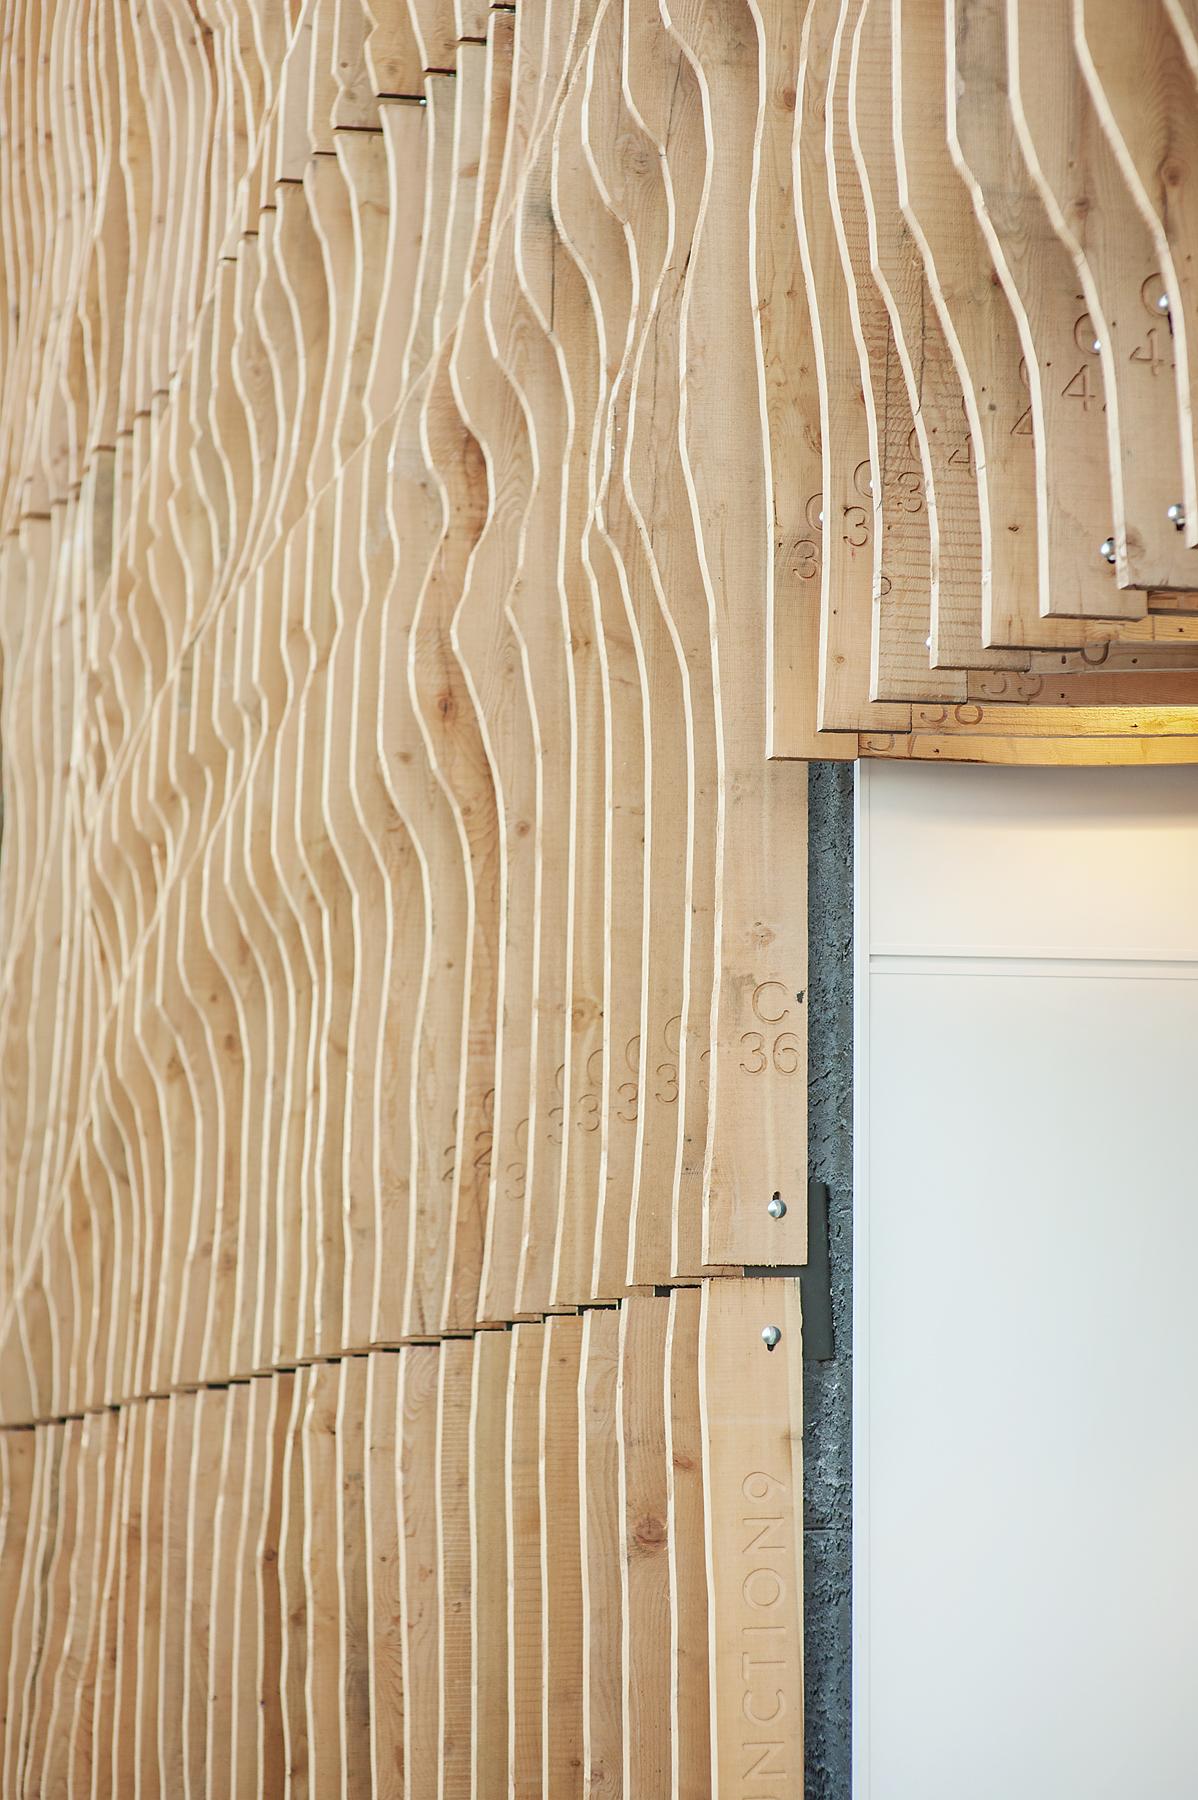 Junction 9 Yoga & Pilates Studio, Architecture by MODERN OFFICE OF DESIGN + ARCHITECTURE | MoDA